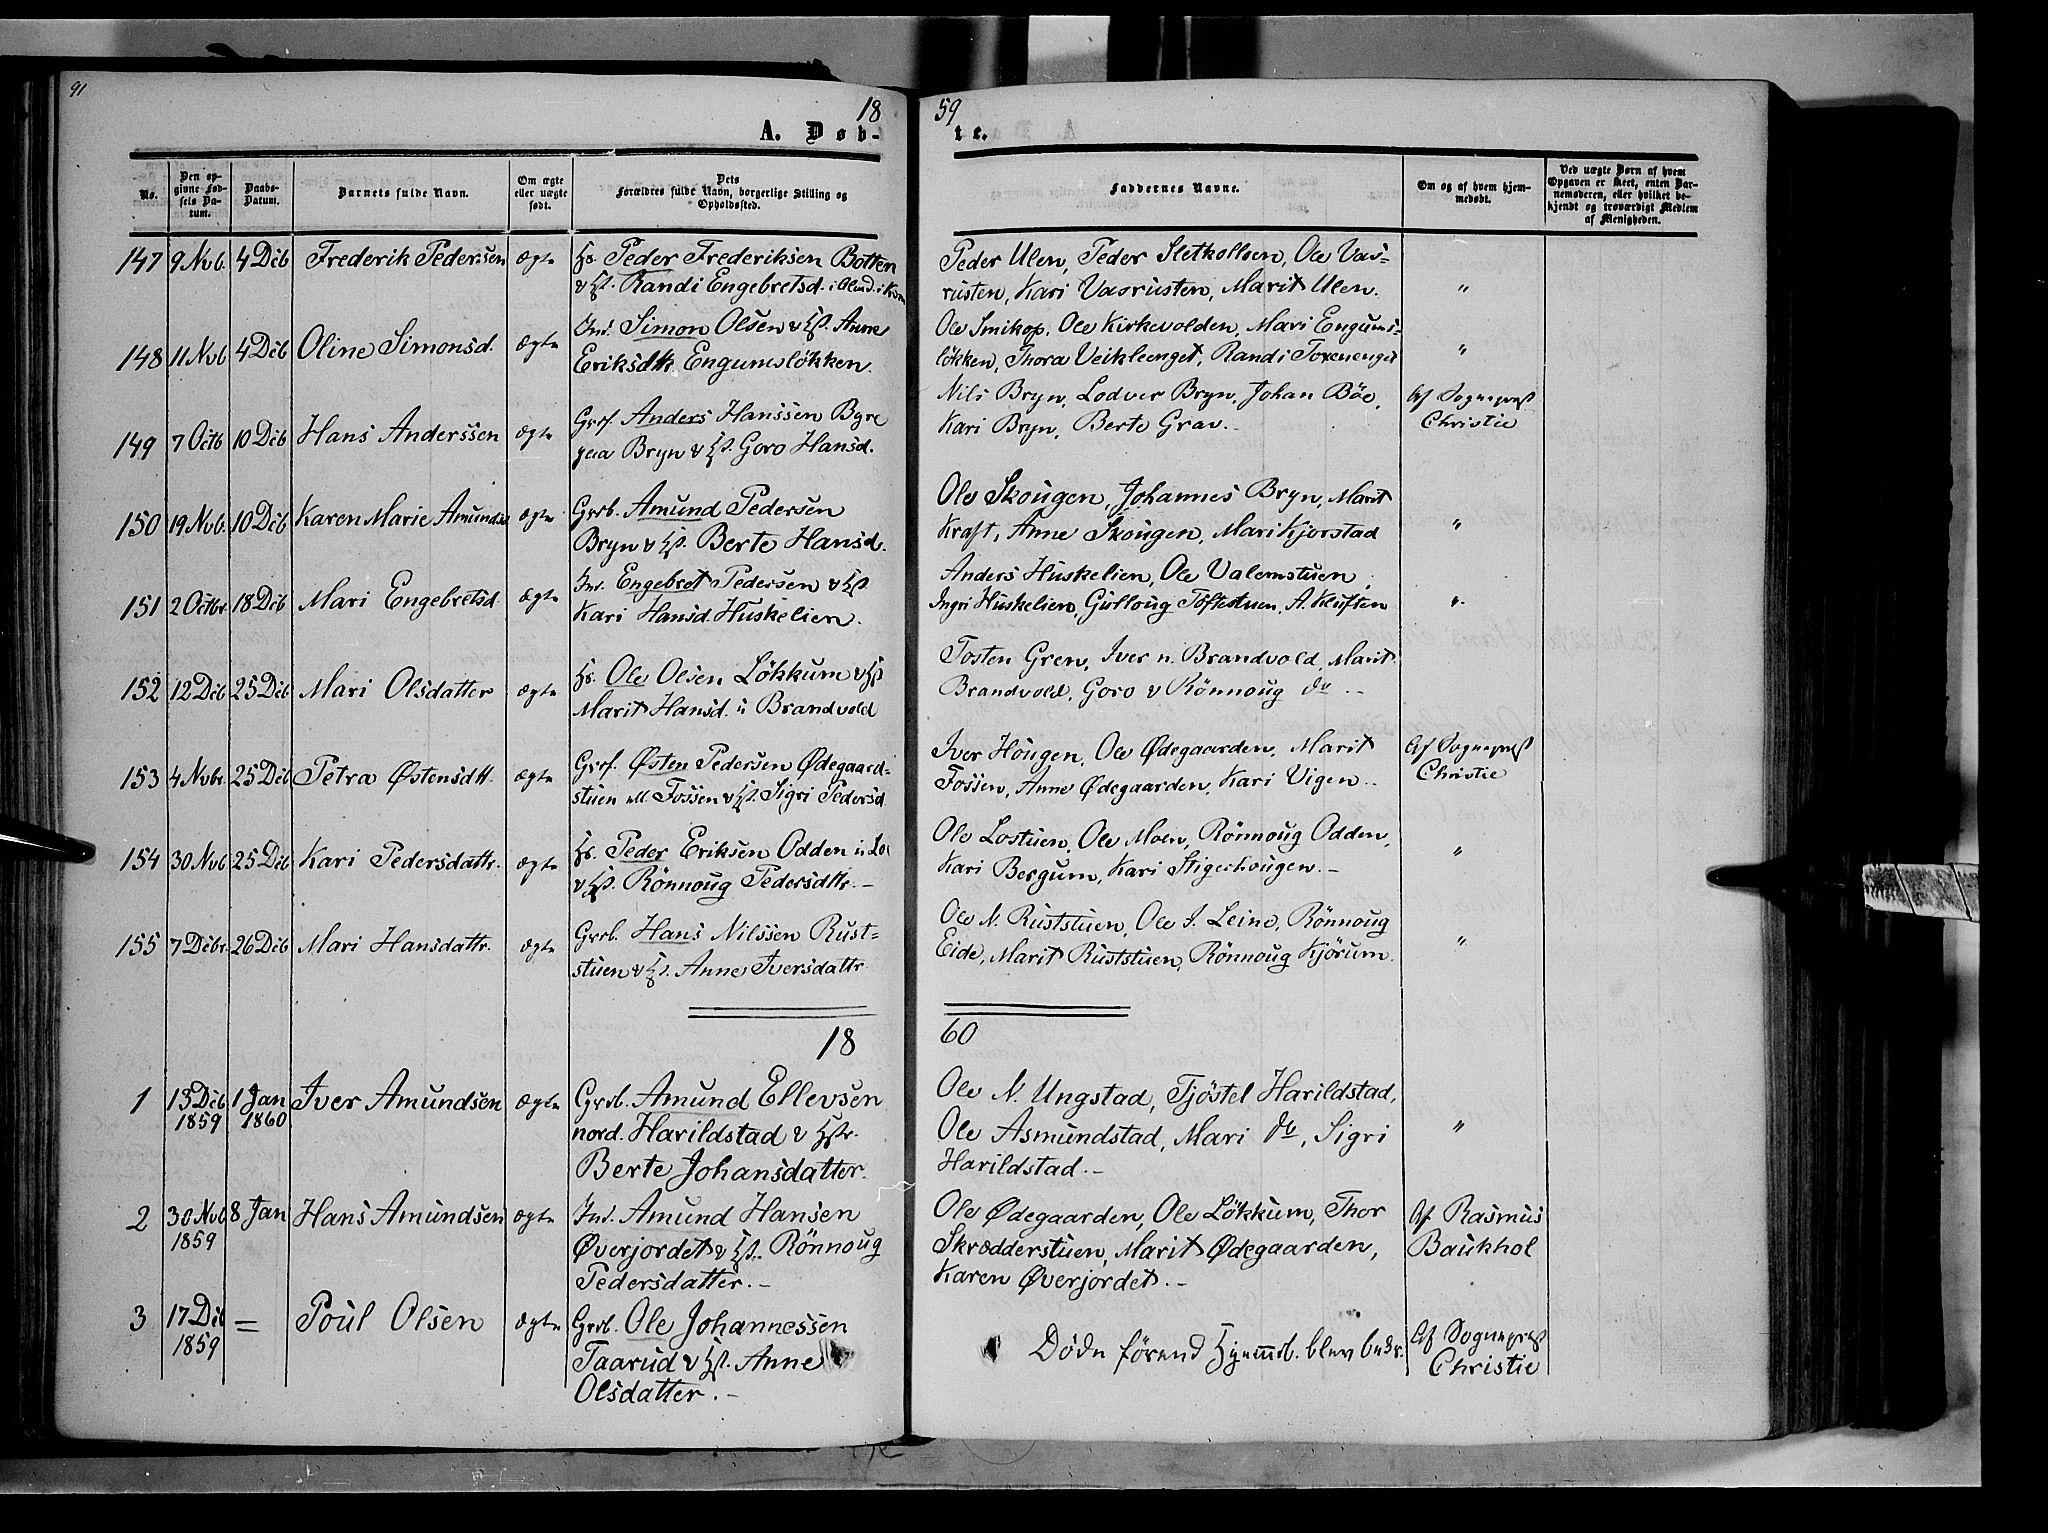 SAH, Nord-Fron prestekontor, Ministerialbok nr. 1, 1851-1864, s. 91